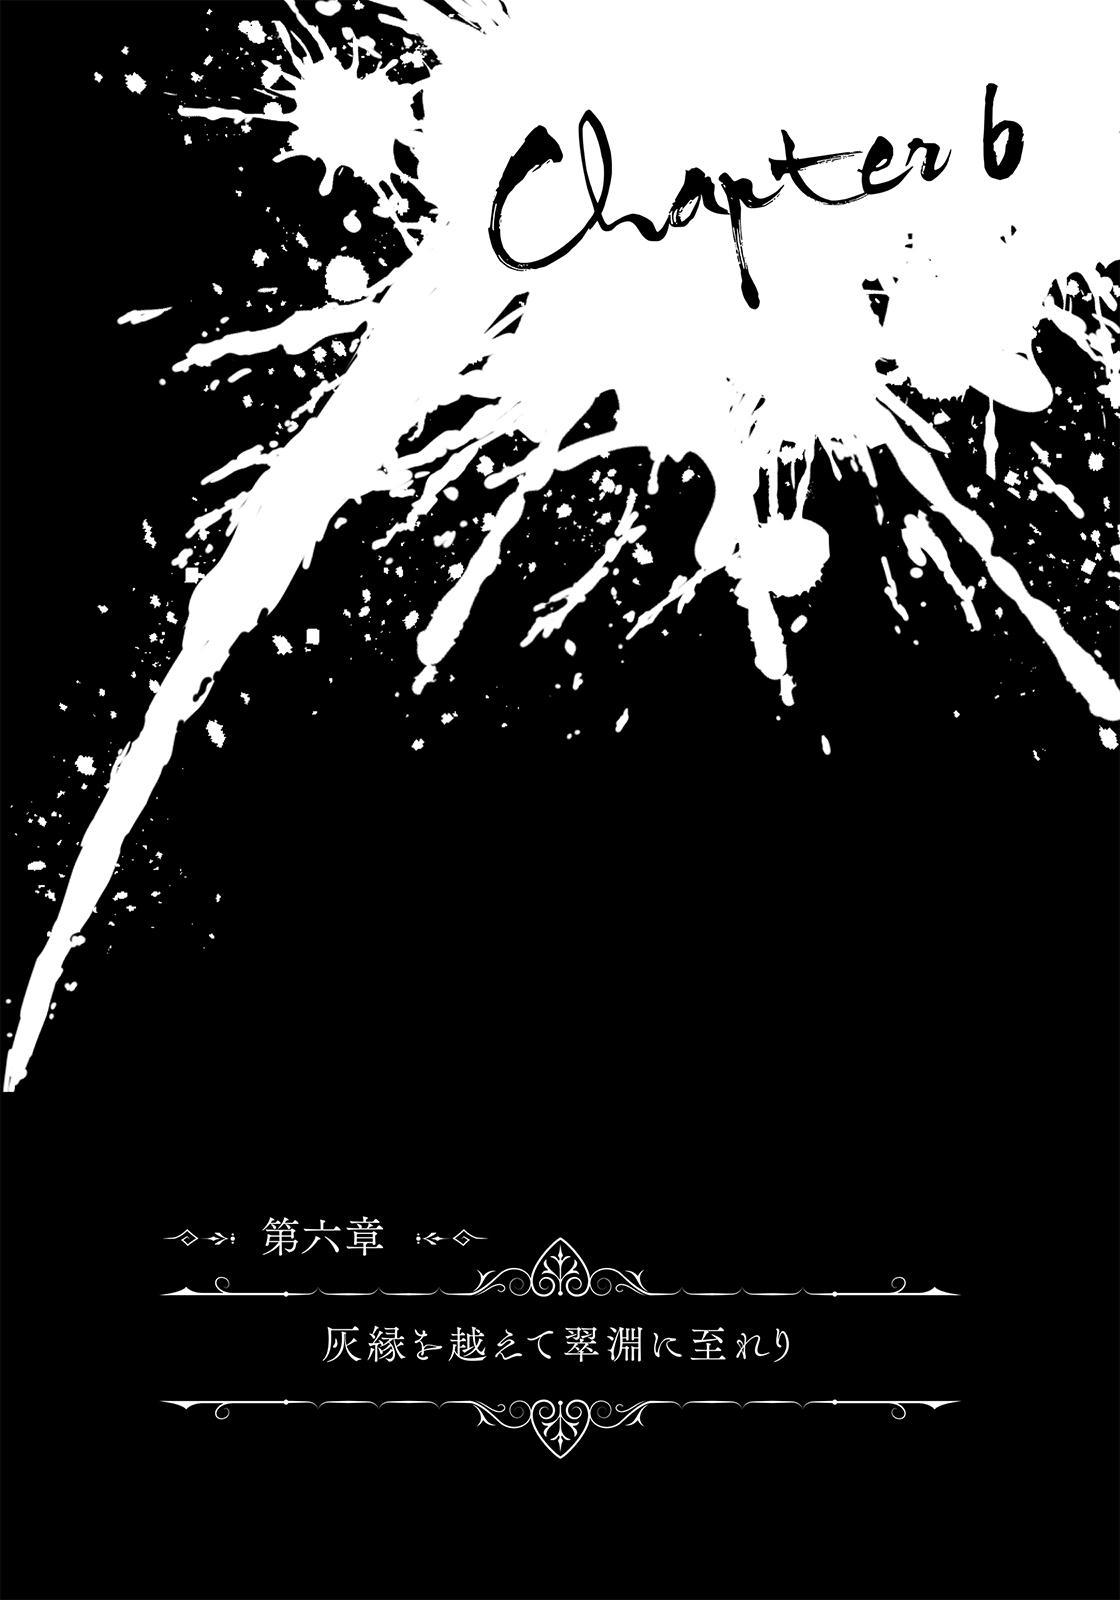 Elvenblood - Vol 2 Chapter 6